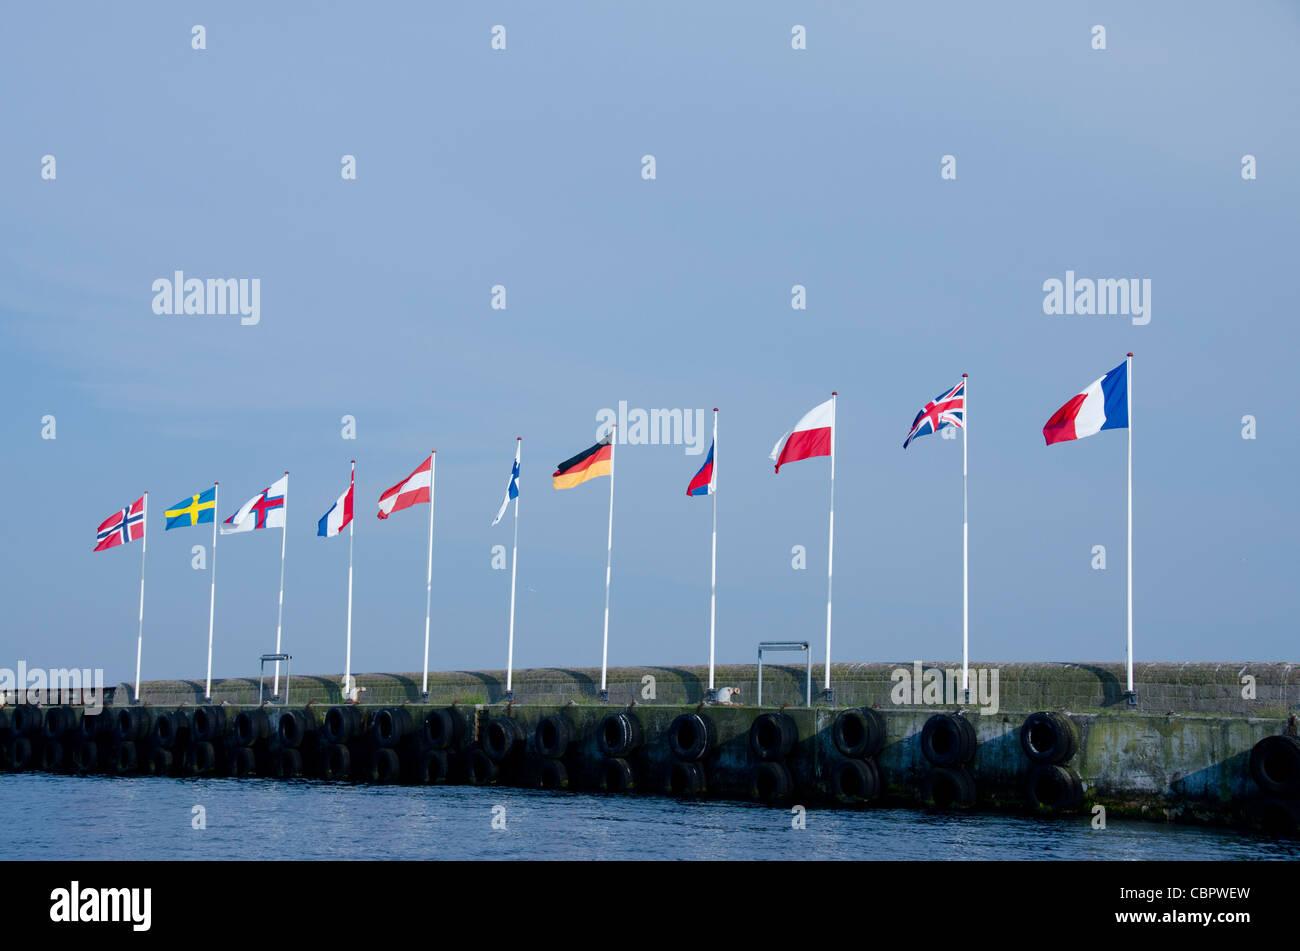 Denmark, Helsingoer. Port harbor area with EU flags. - Stock Image